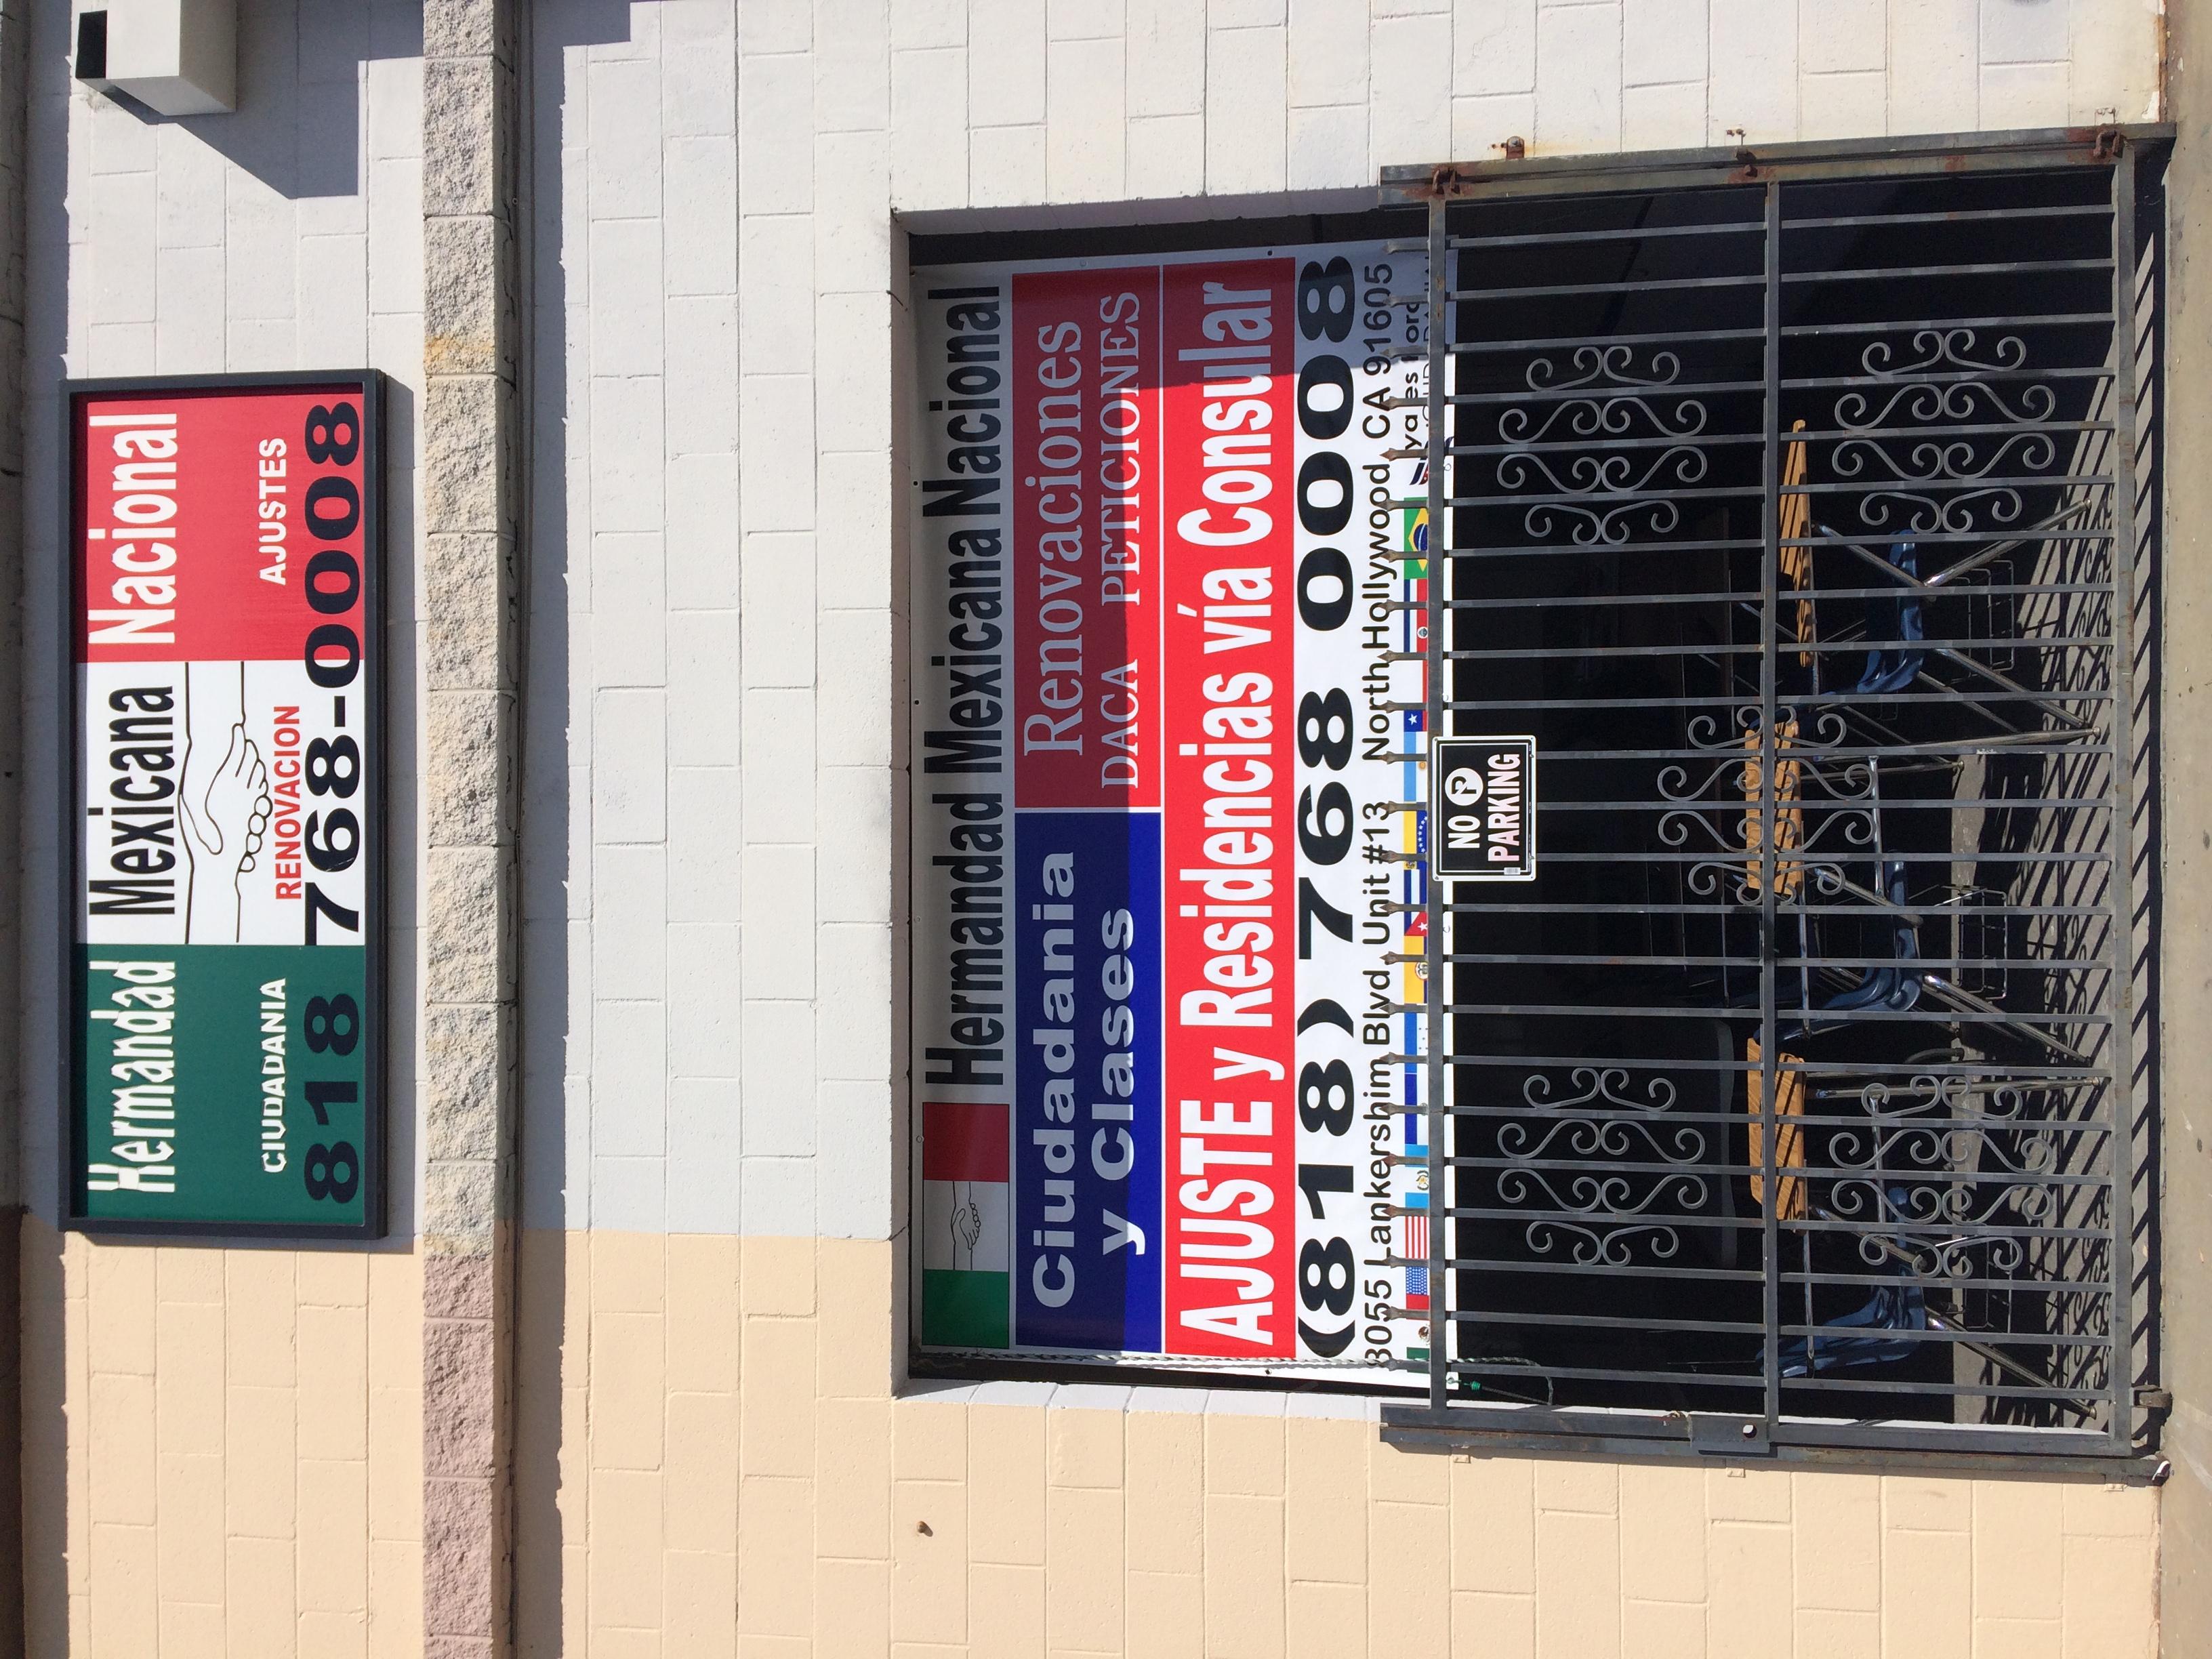 Hermandad Mexicana Nacional 8055 Lankershim Blvd, #13, North